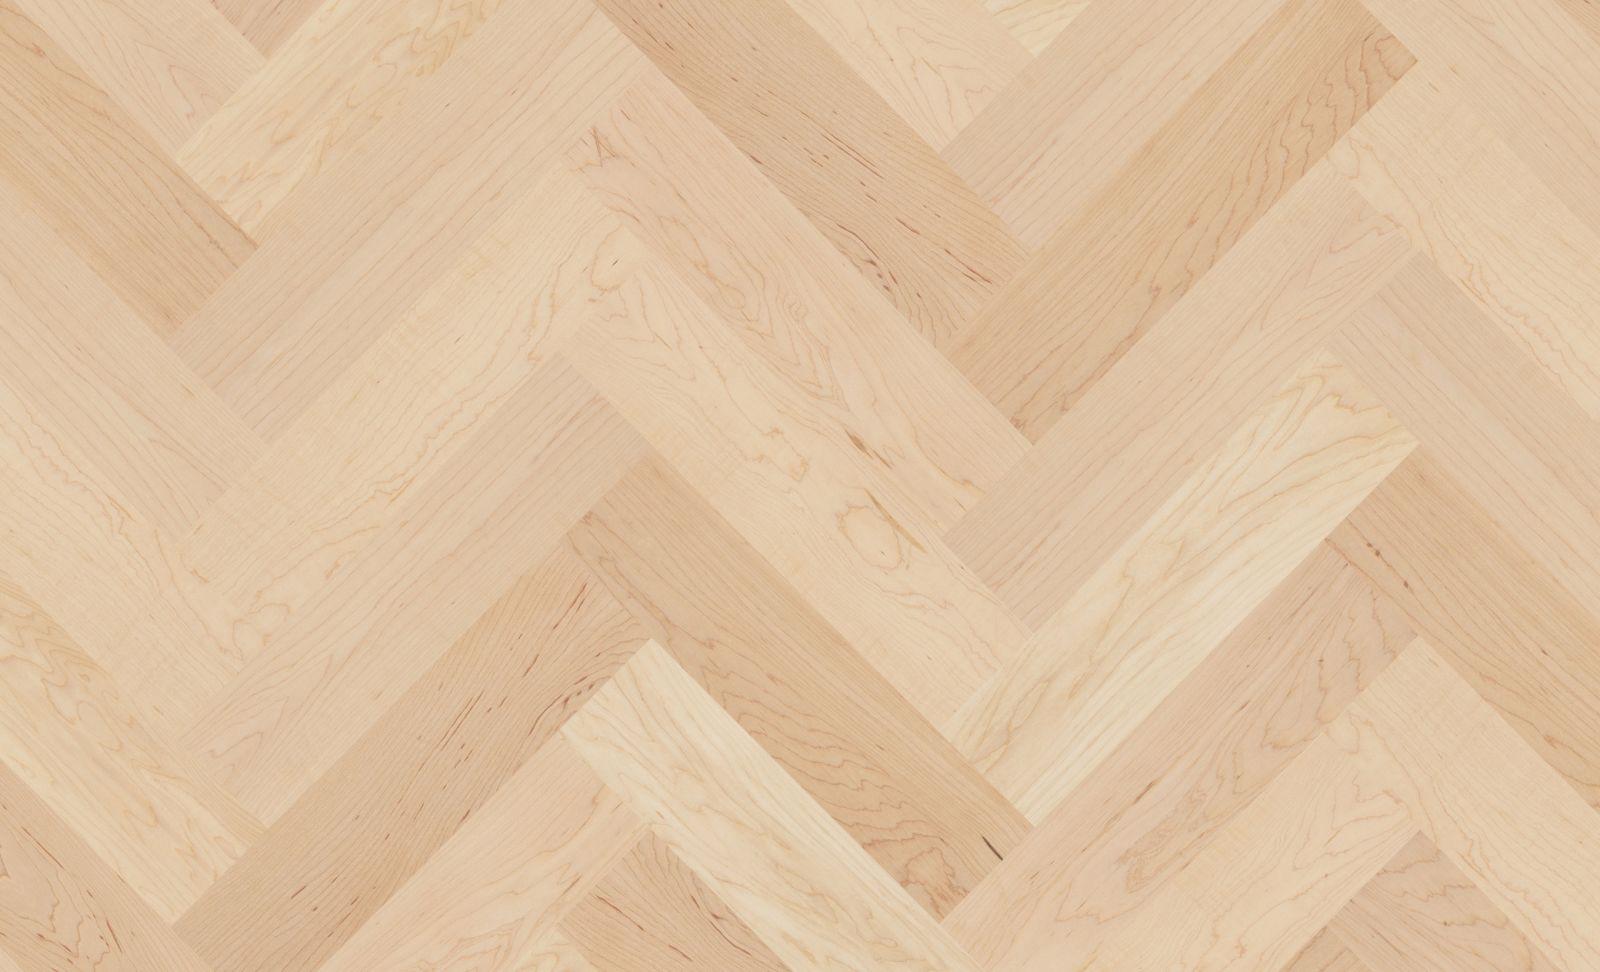 Mercier Wood Flooring Hard Maple Naked HRDMPLNKD